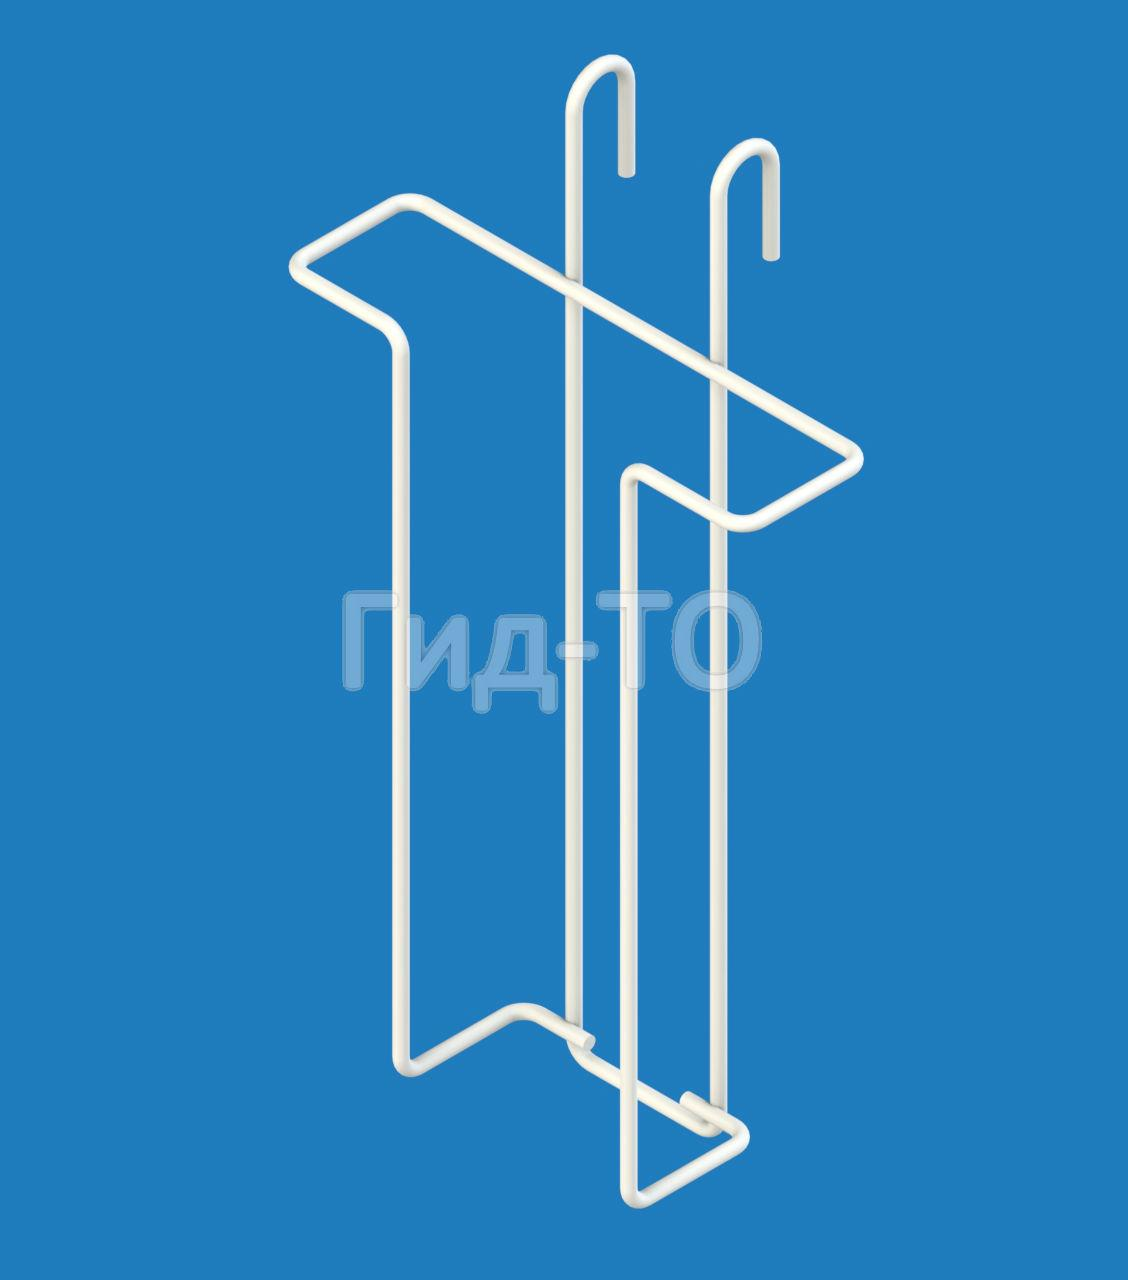 Карман навесной для стендов формата А6